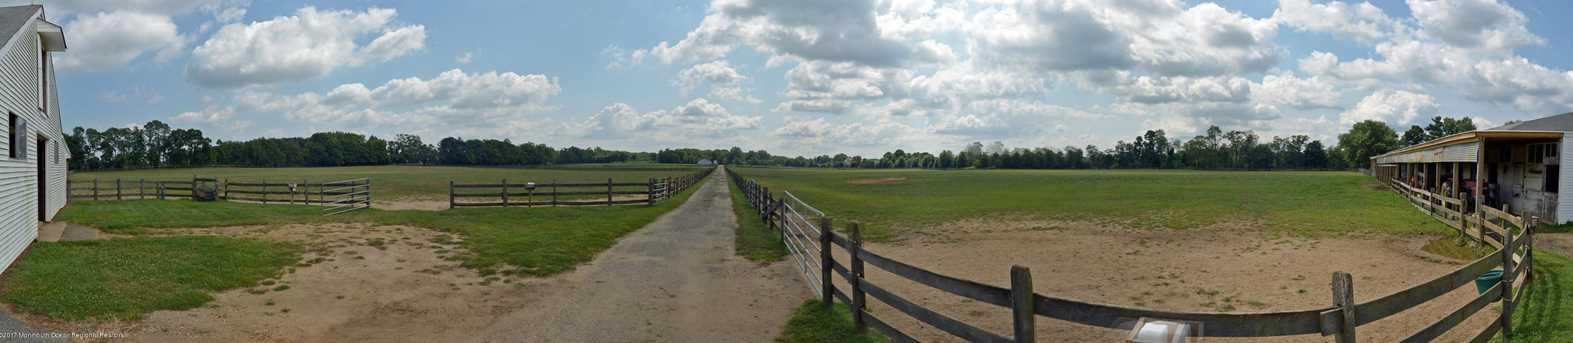 148 County Road 537 - Photo 35